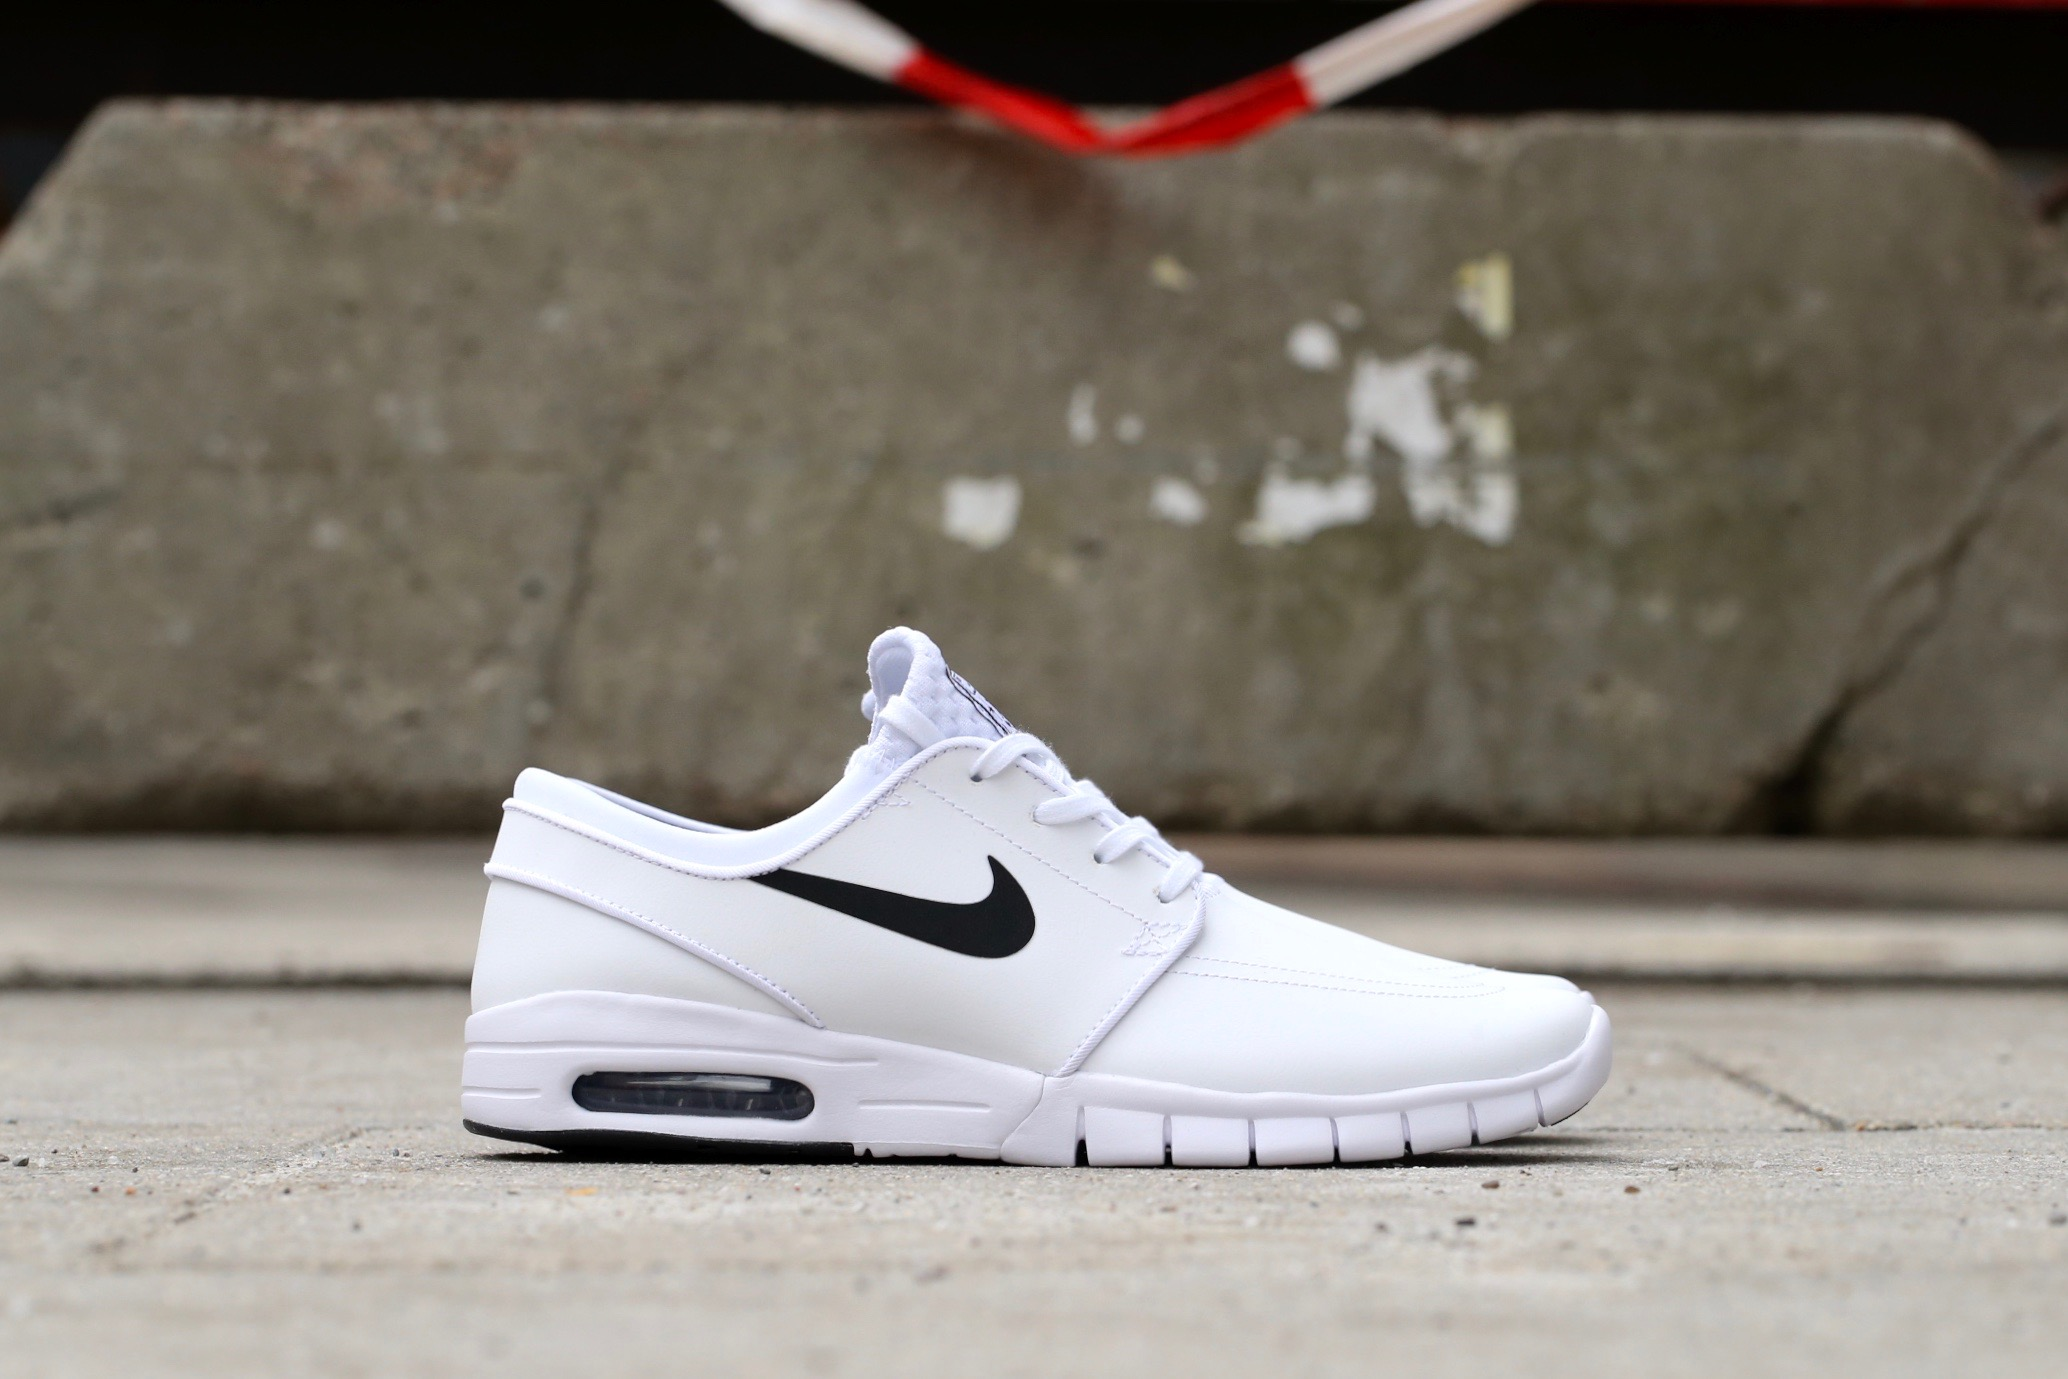 100% authentic 3beb7 9cfe6 Nike SB Stefan Janoski Max L – White   Black – STASP